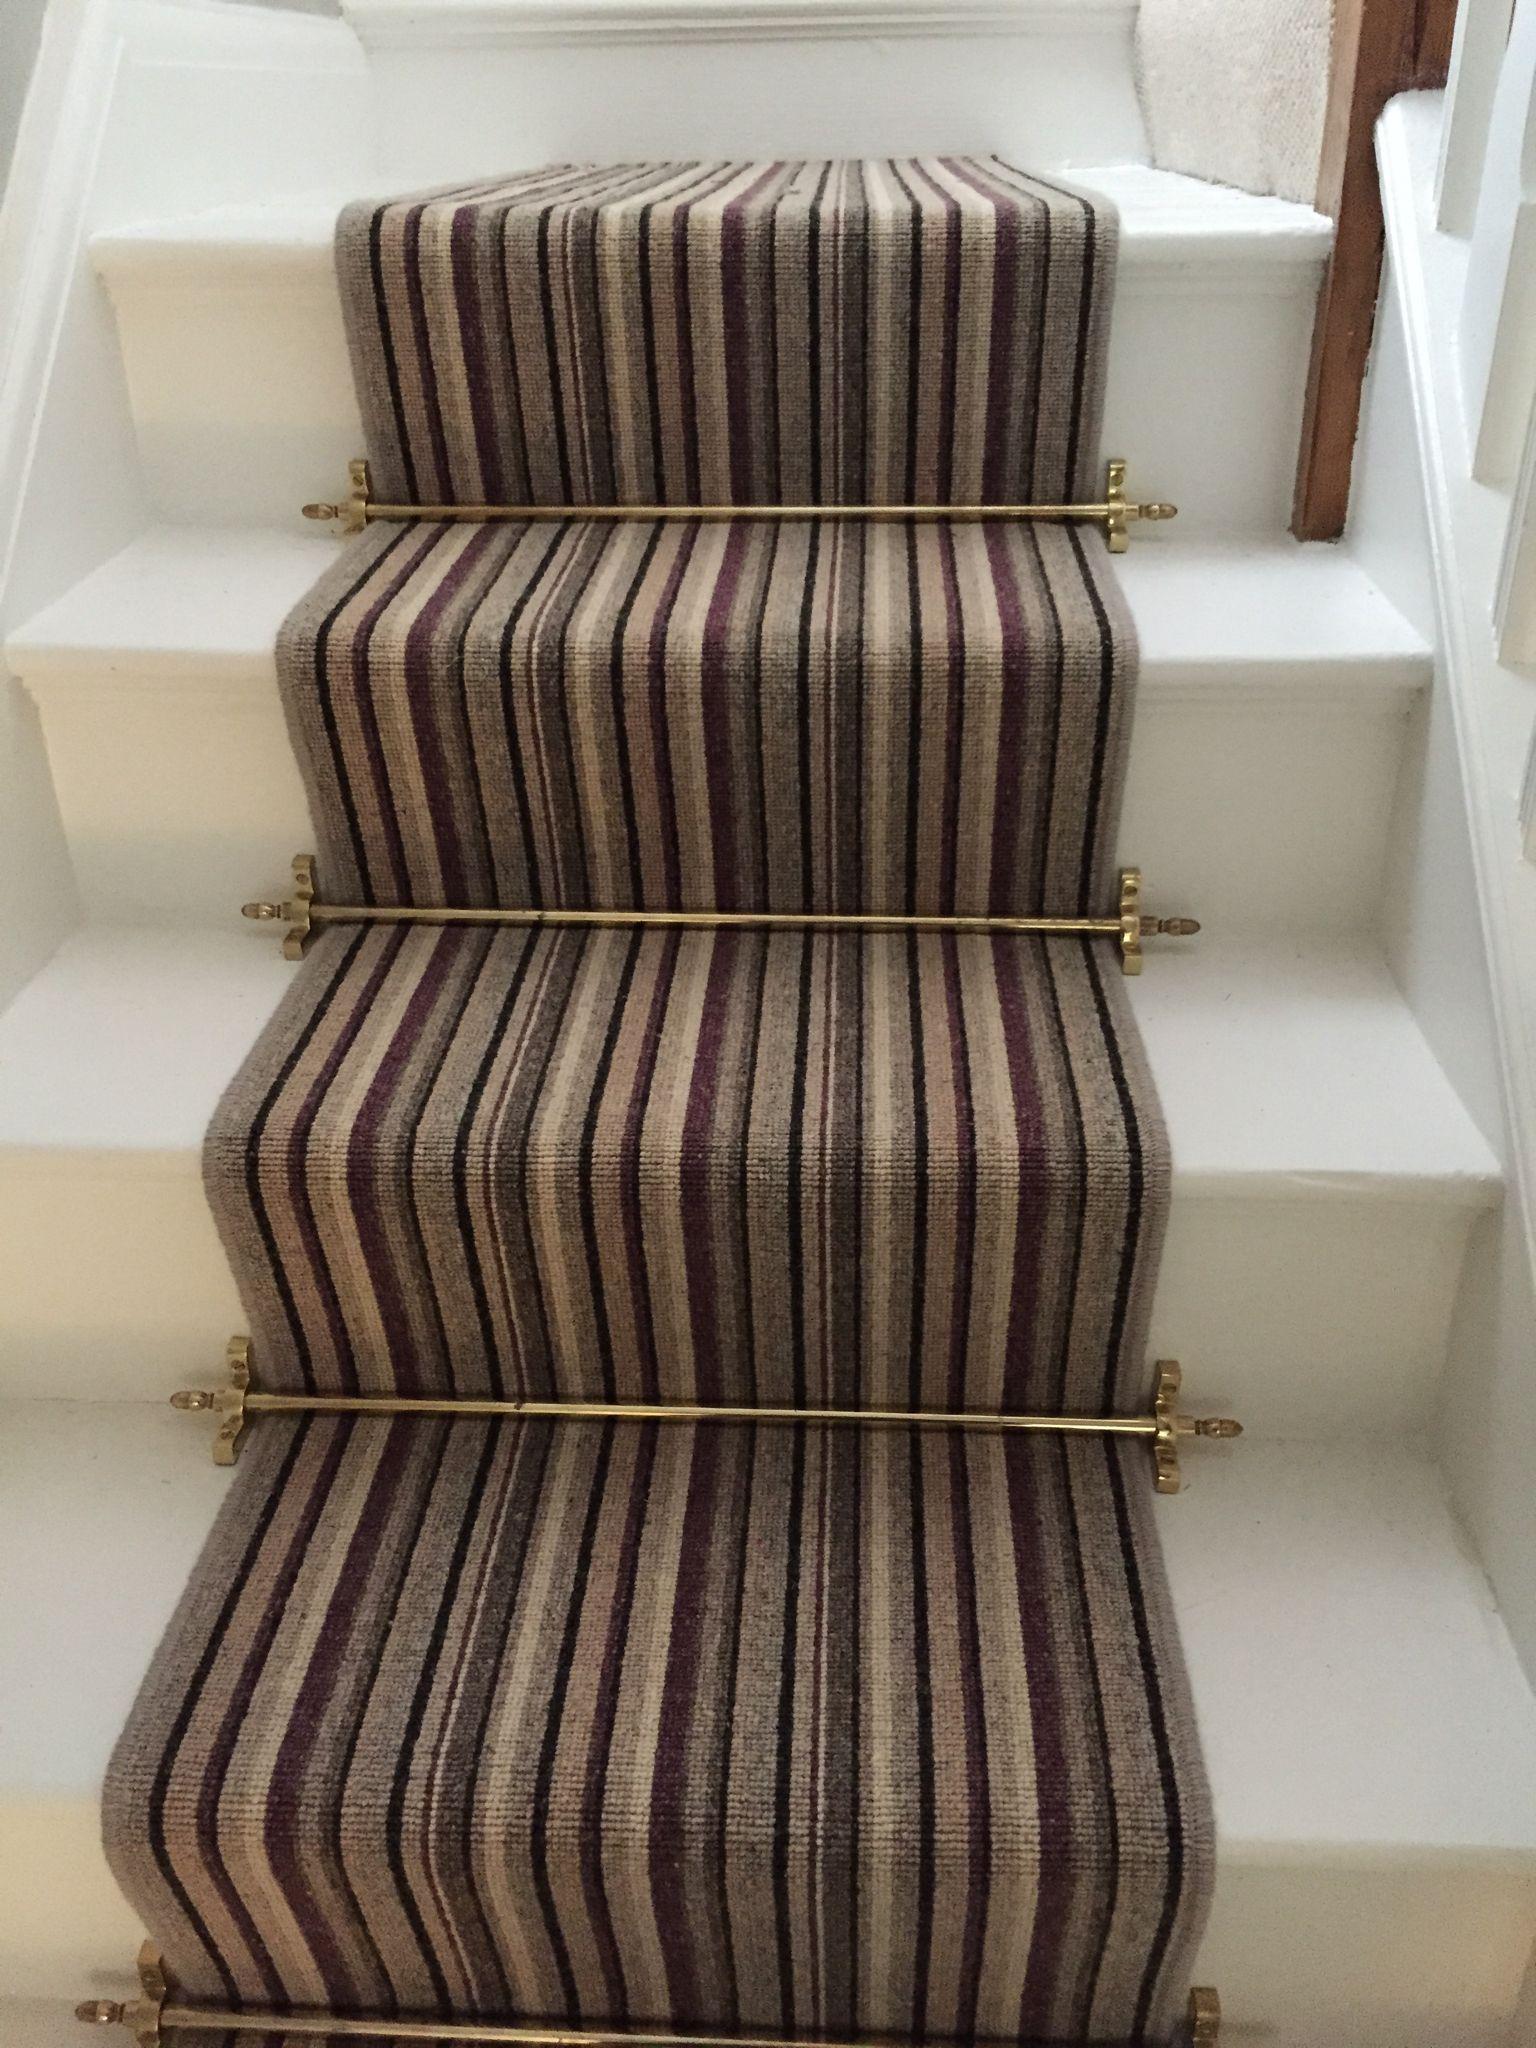 Telenzo Bakerloo Striped Carpet Striped Carpets Carpet Stairs Striped Carpet Stairs